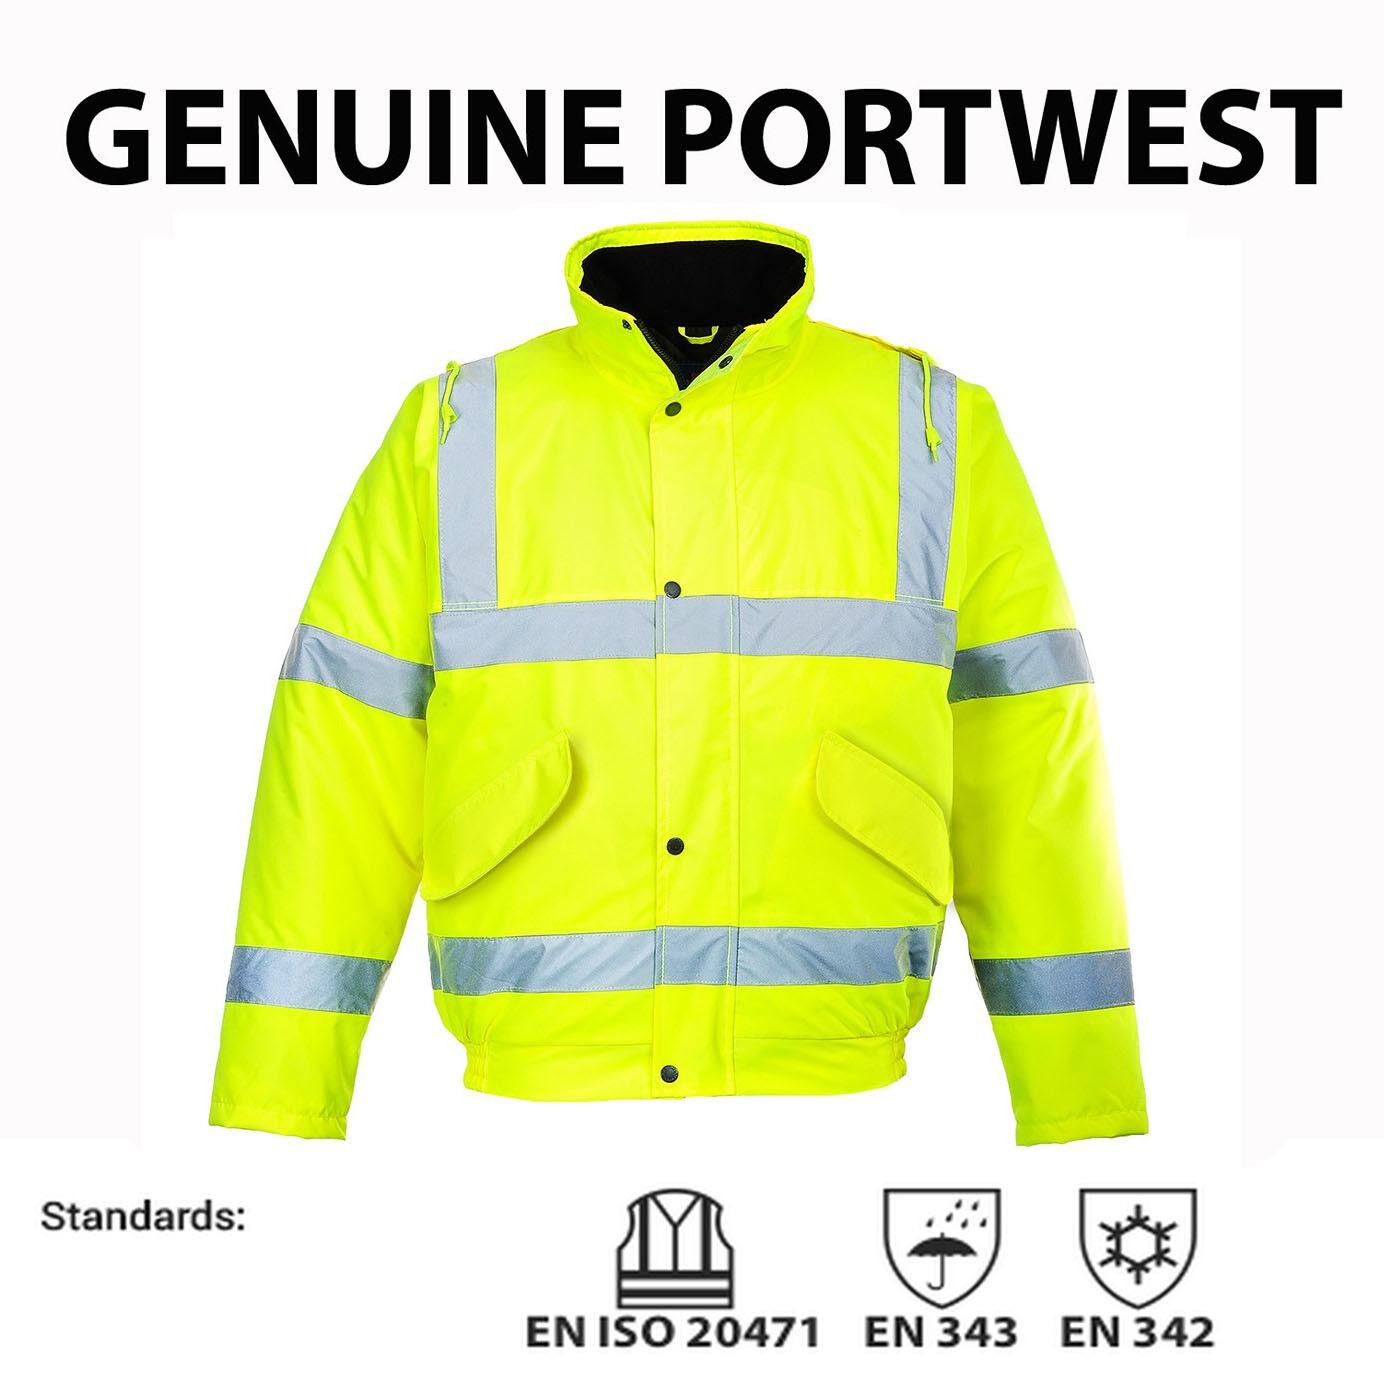 S463 Mens Portwest Hi Vis Visibility Bomber Jacket Coat